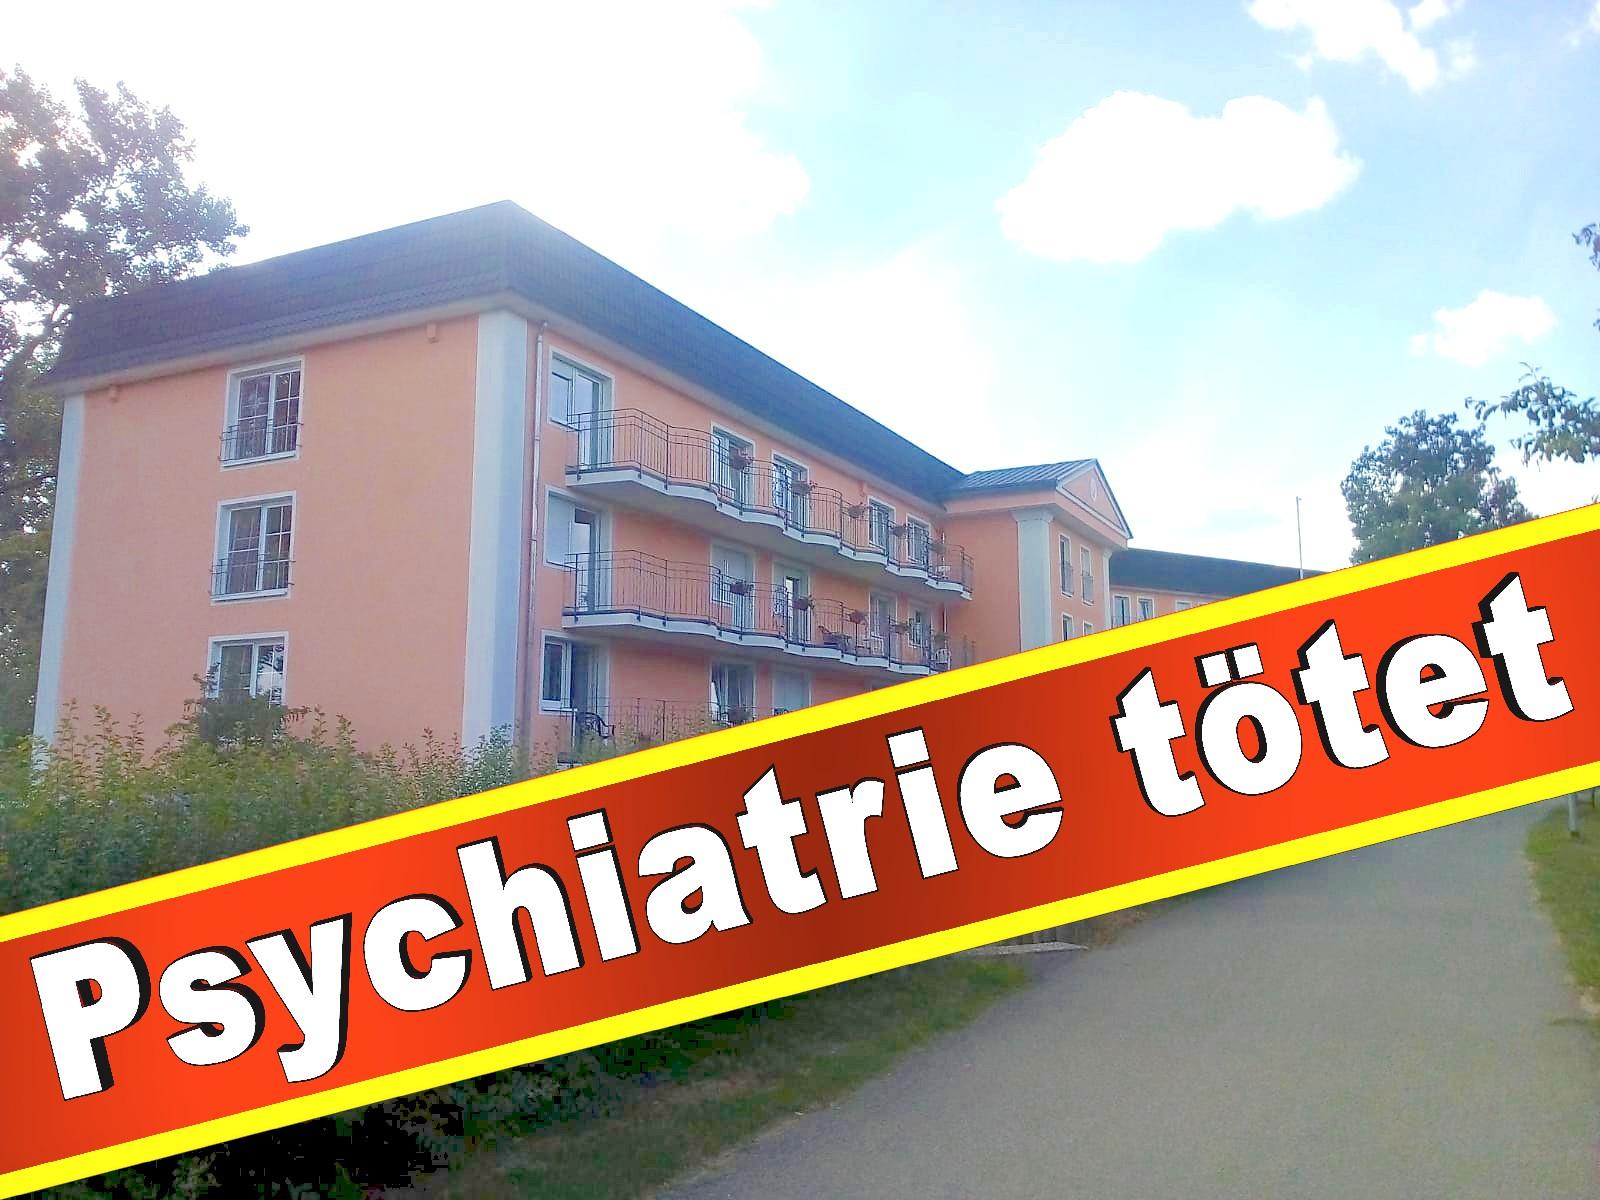 Bezirksklinikum Obermain Kutzenberg, 96250 Ebensfeld Psychiatrie Polizei Krankenhaus (12)